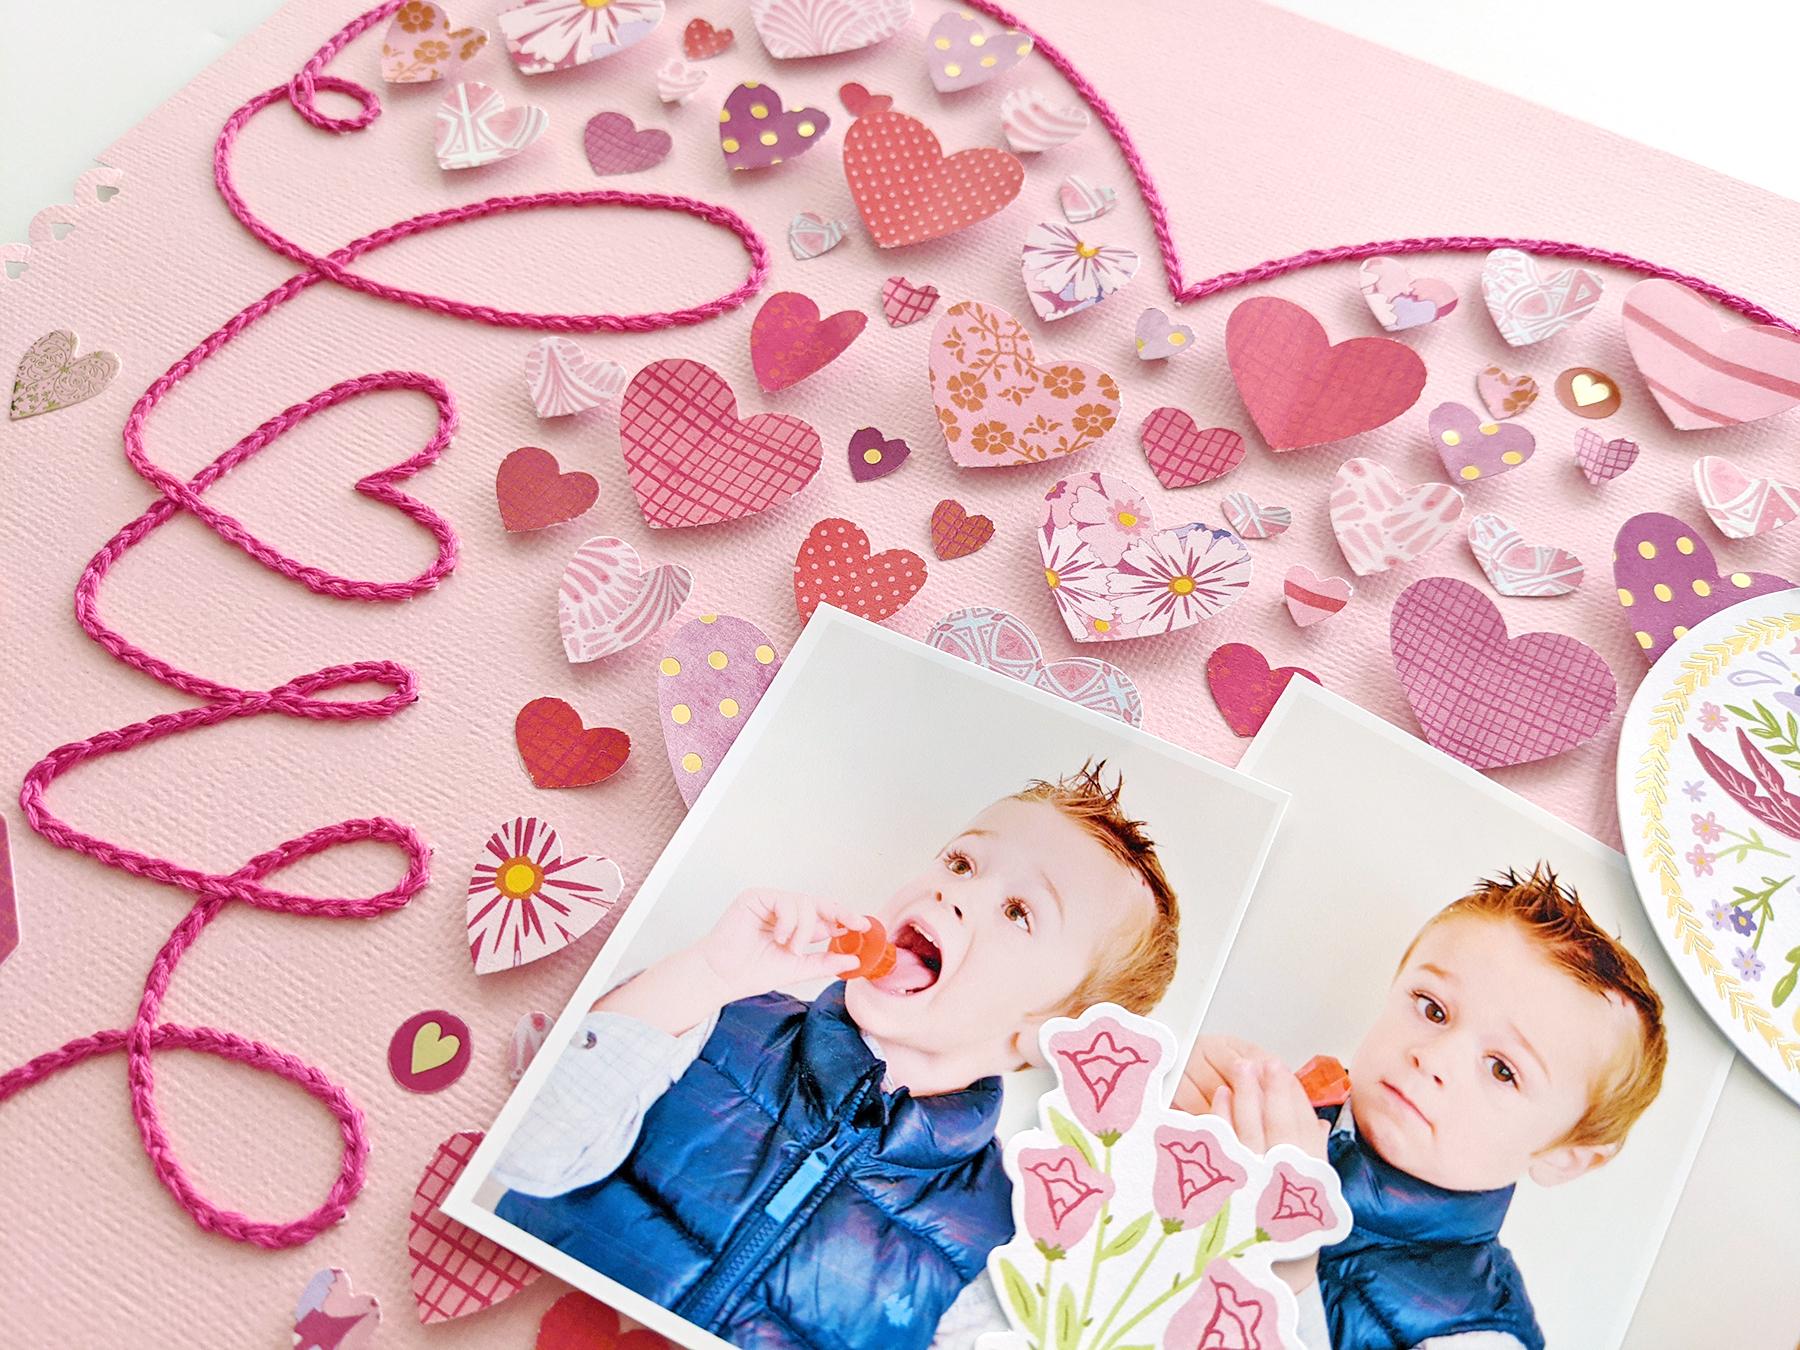 Tighm 2 Love Hearts